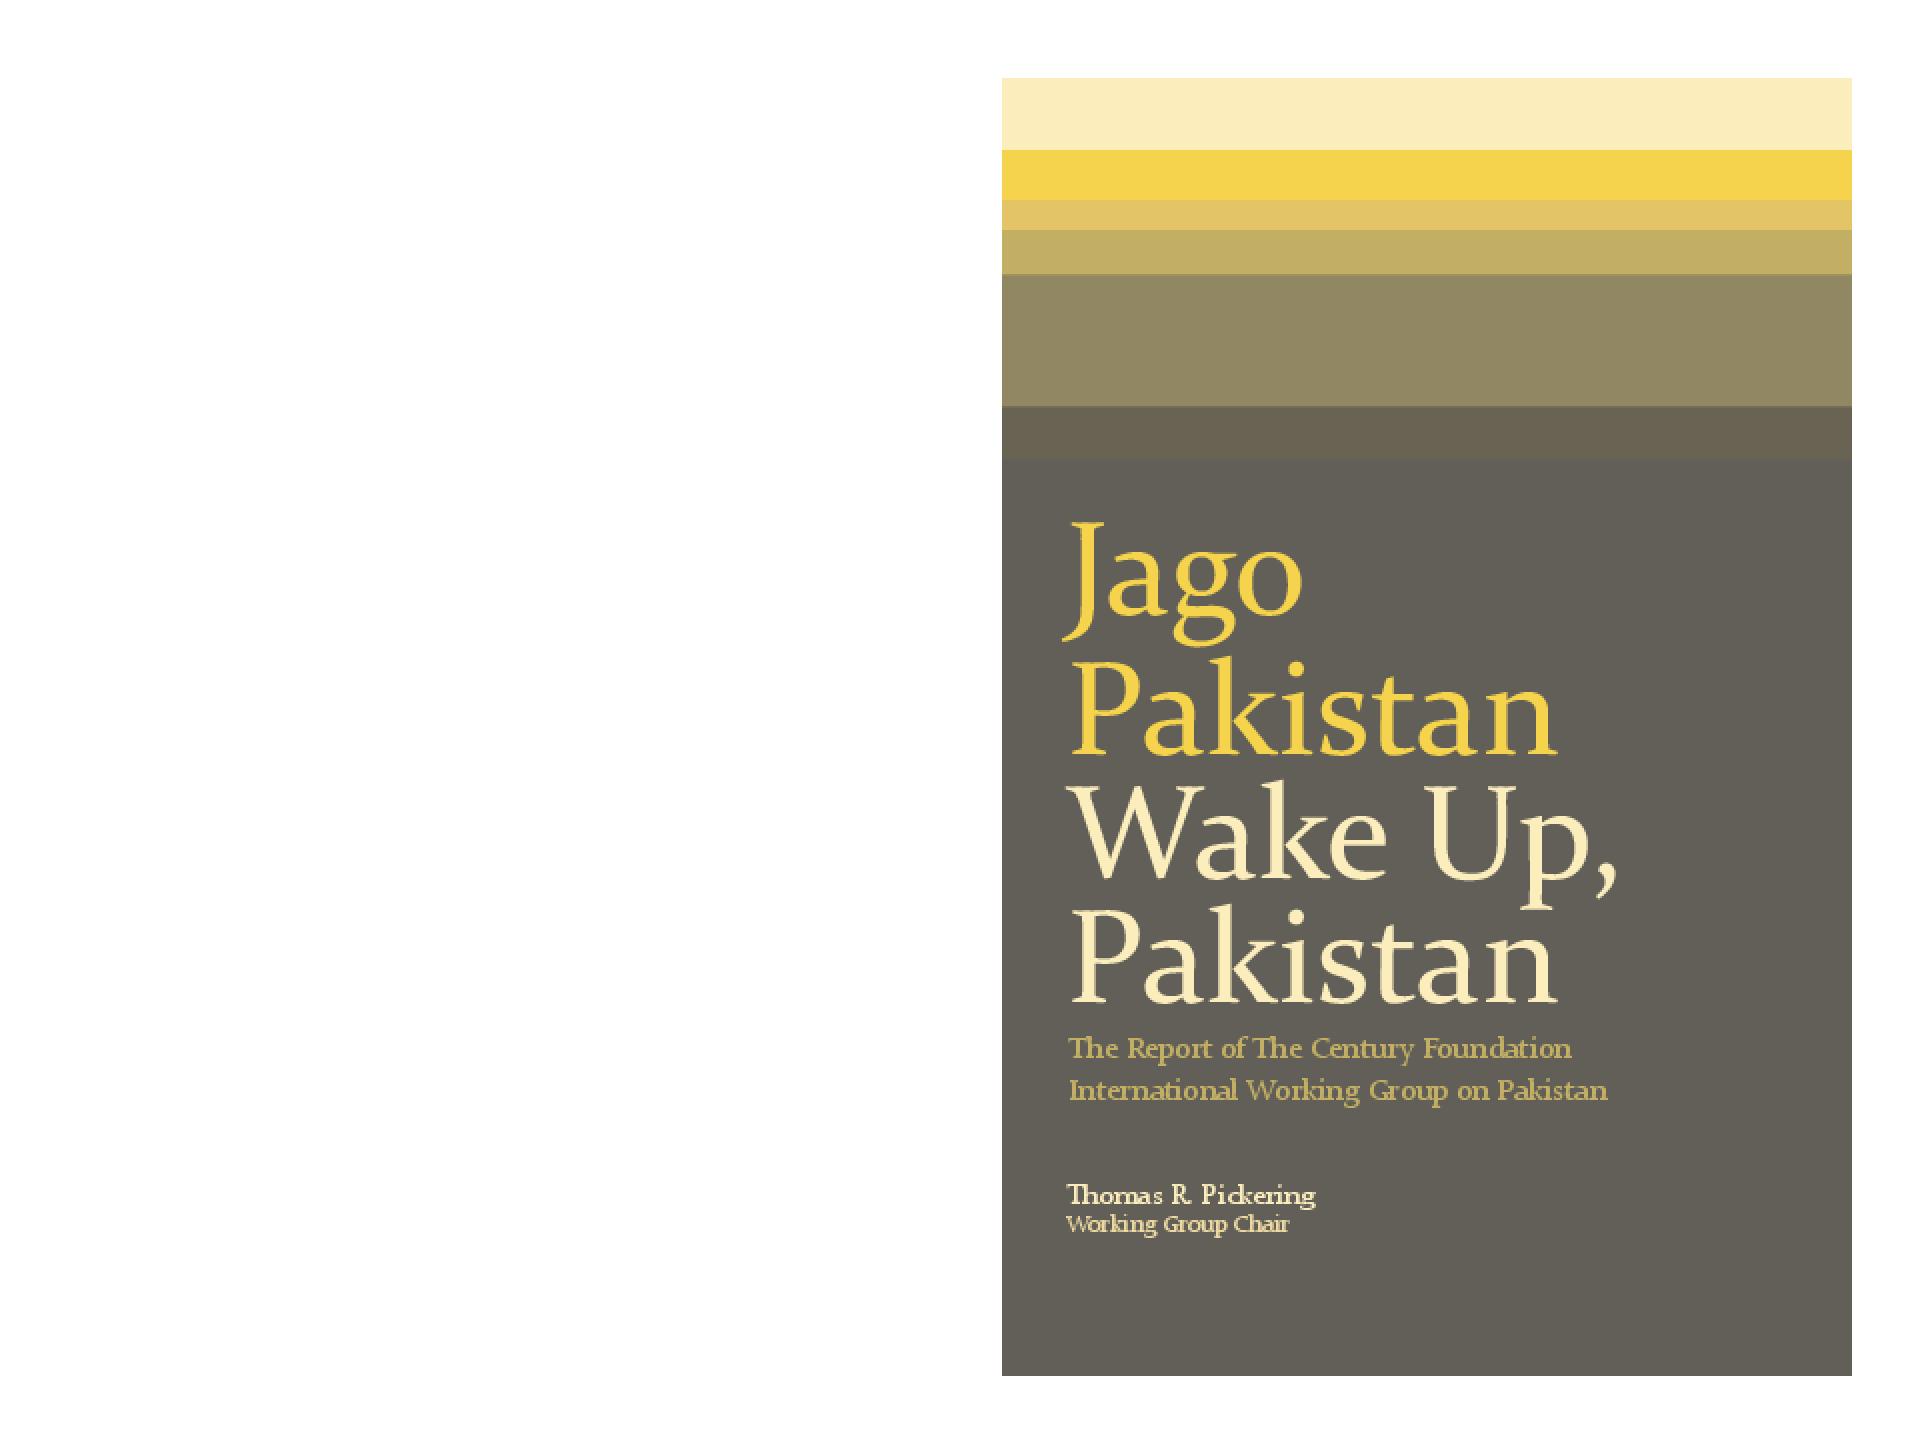 Jago Pakistan/ Wake Up, Pakistan: The Report of the Century Foundation International Working Group on Pakistan